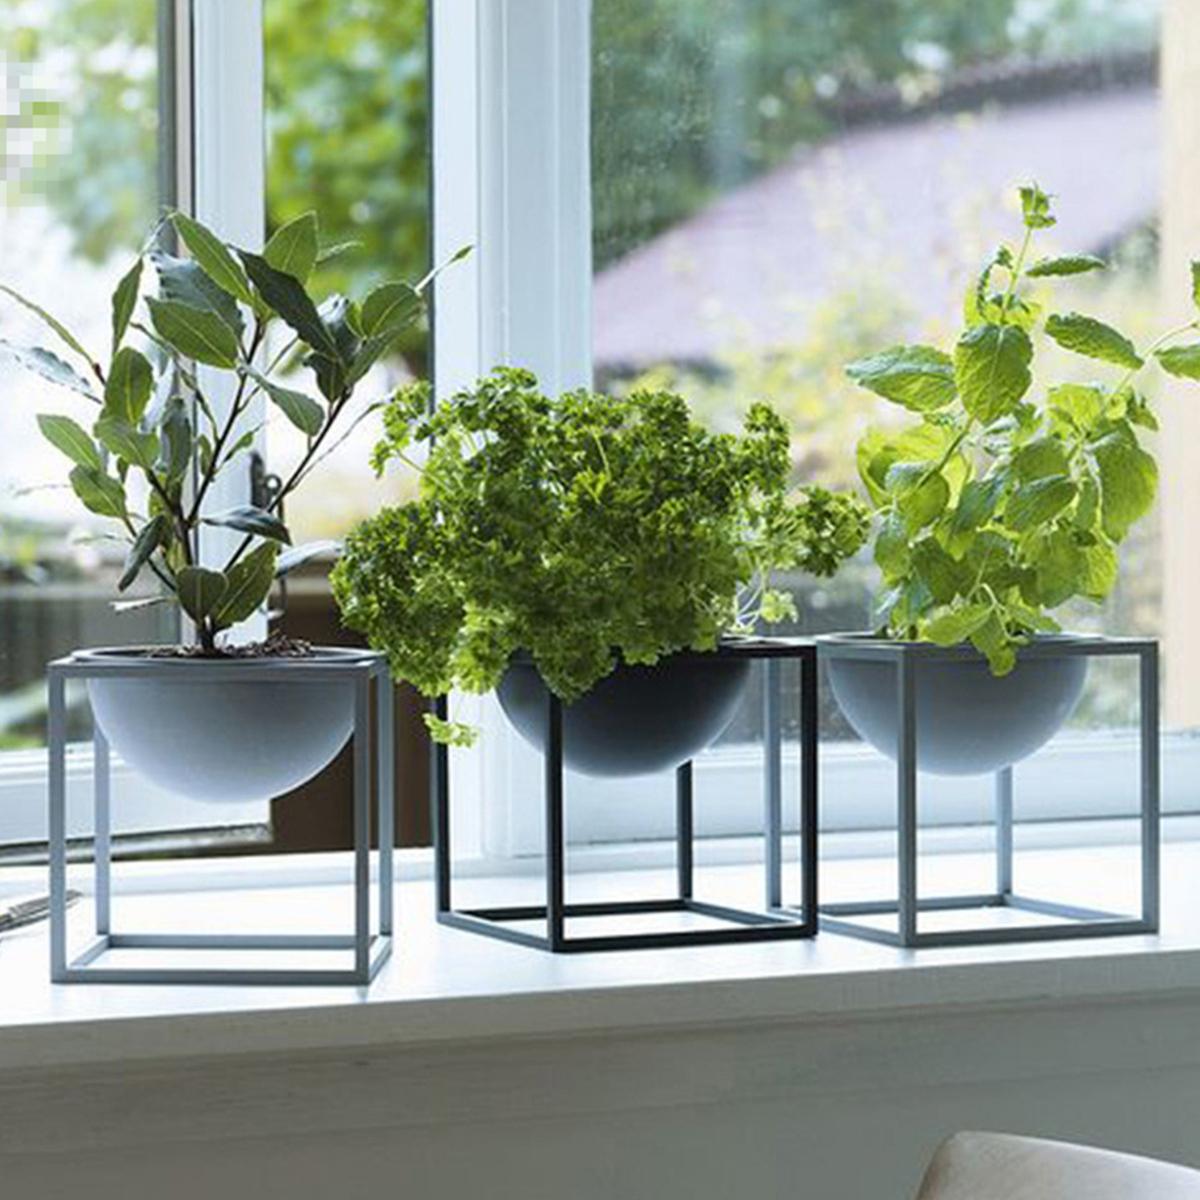 20cm-Holder-Plant-Metal-Pot-Stand-Planter-Garden-Flower-Display-Rack-Shelves